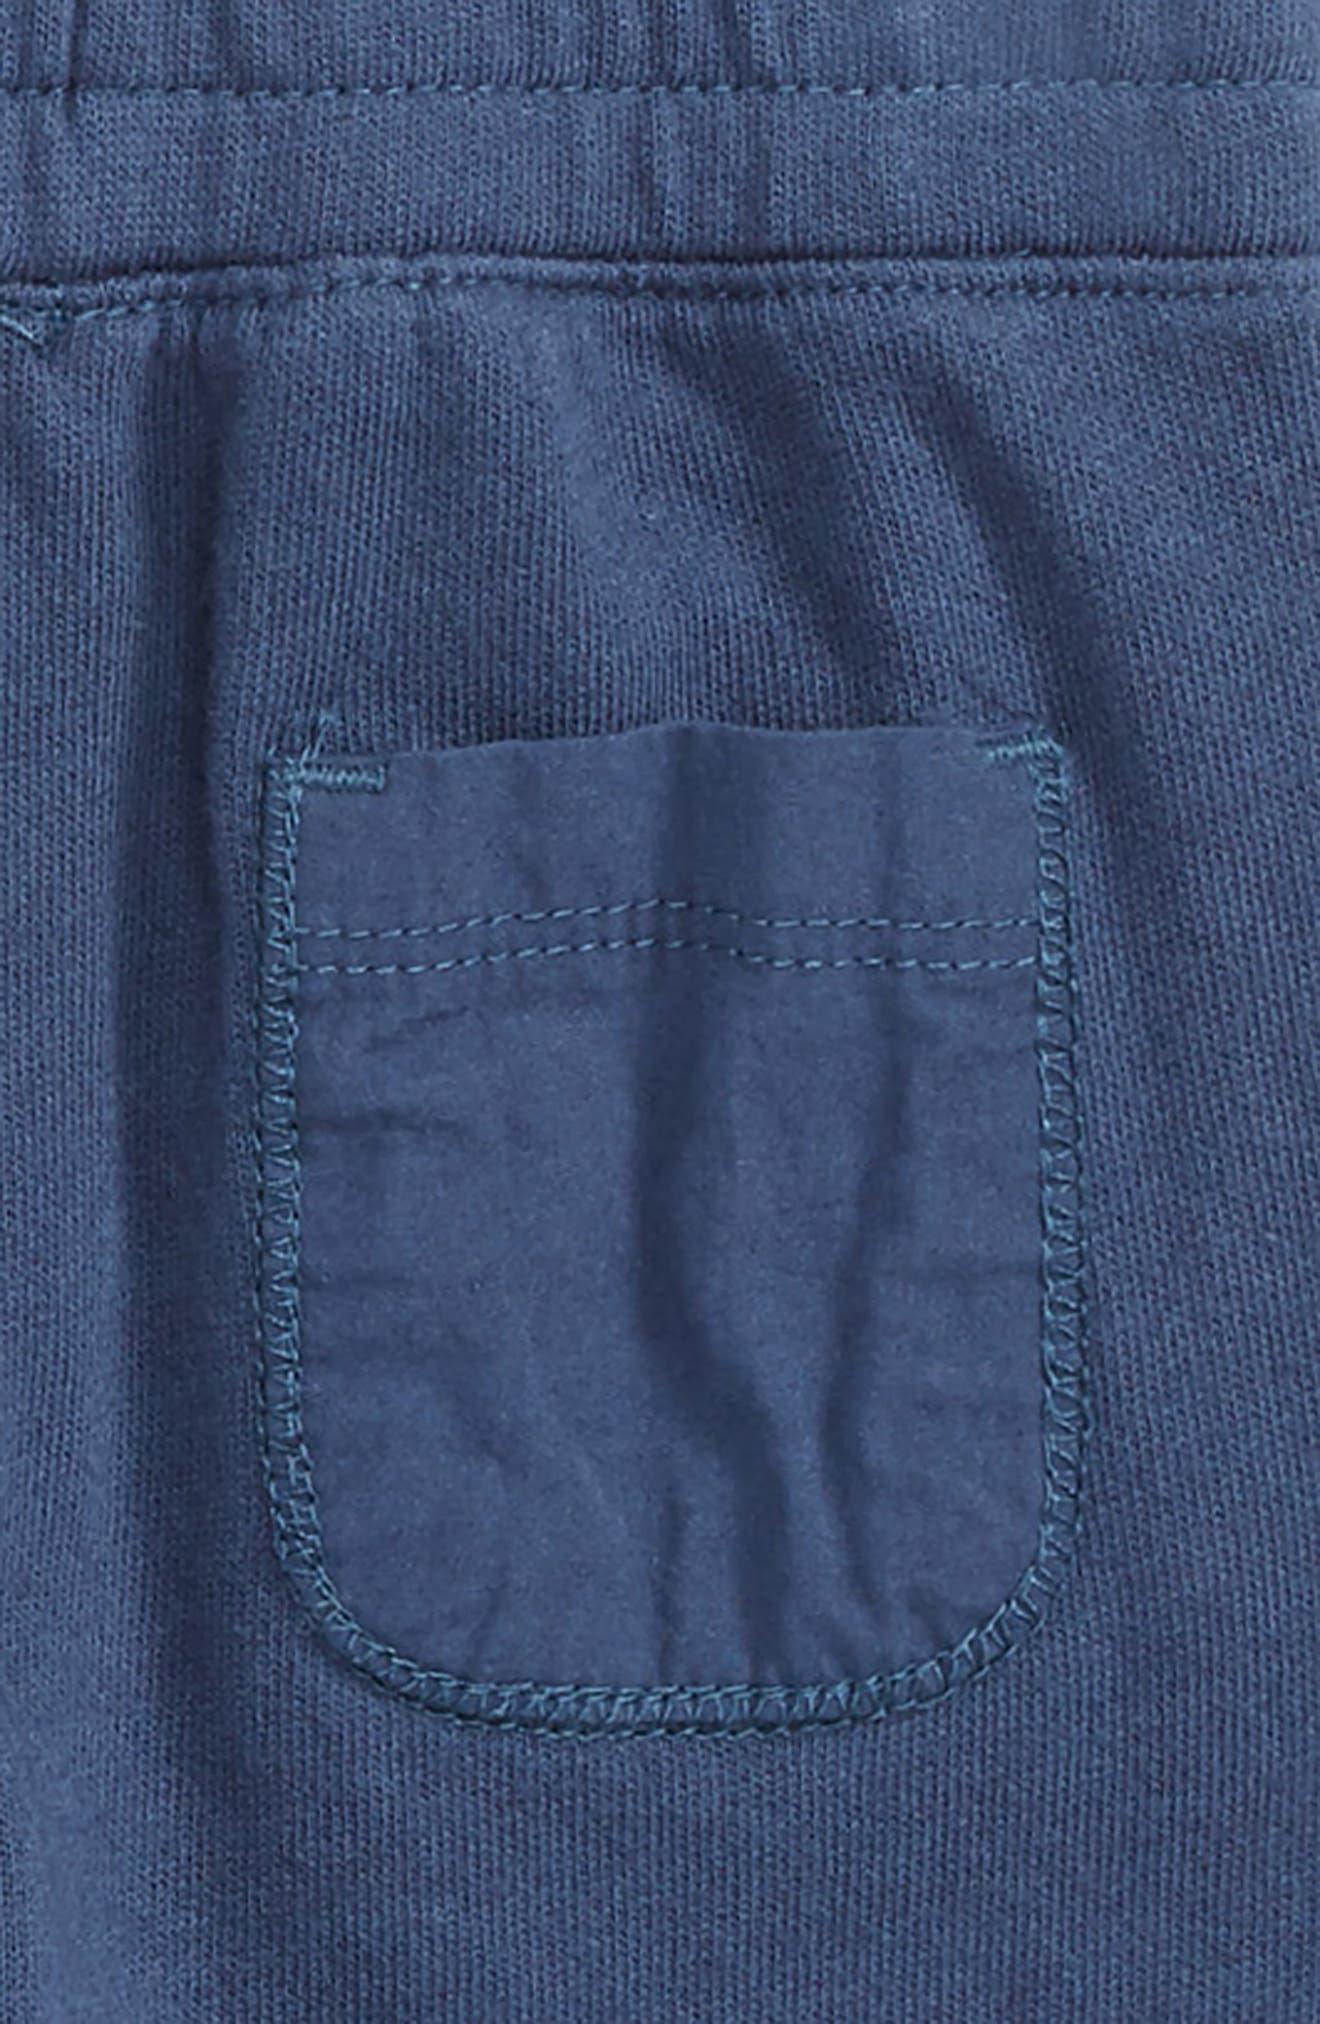 Stripe Henley T-Shirt & Pants Set,                             Alternate thumbnail 3, color,                             400